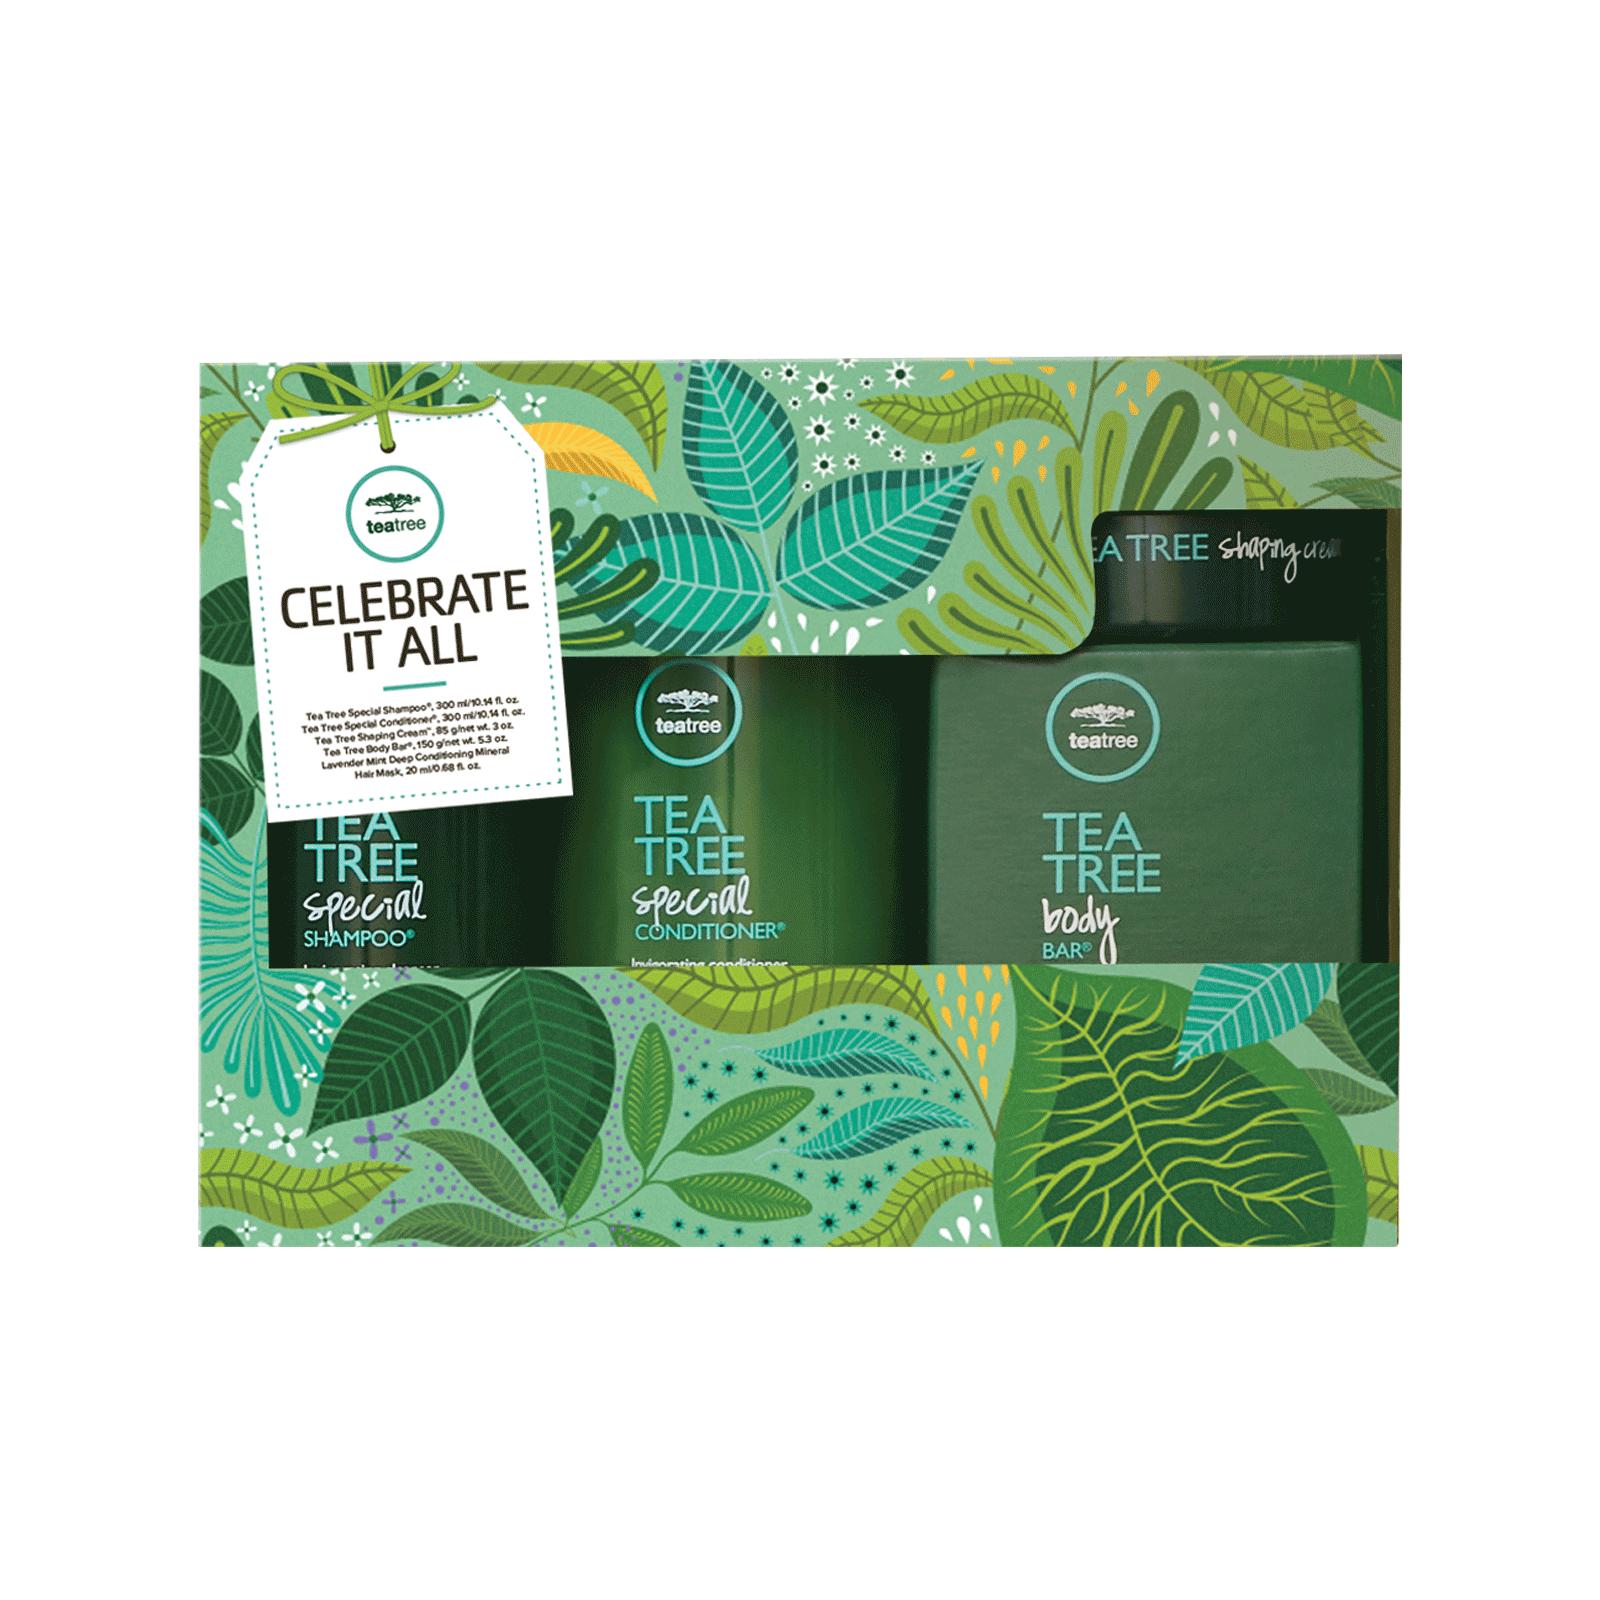 Paul Mitchell Tea Tree Shampoo, Conditioner, Body Bar, Shaping Cream 10.1